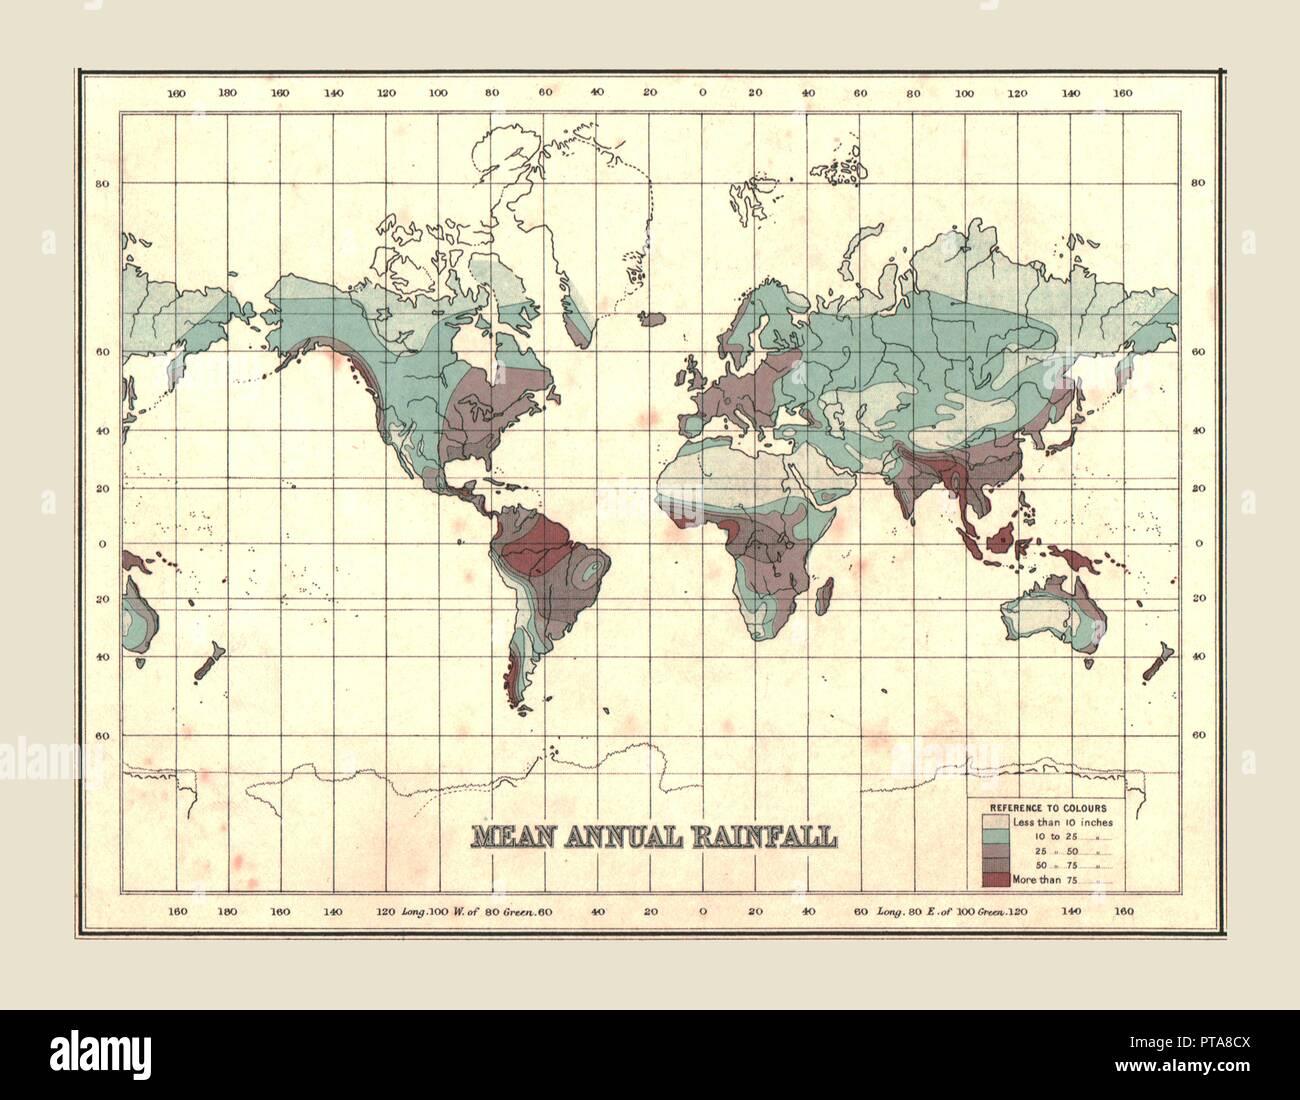 Mapa del mundo mostrando precipitación media anual de 1902. A partir del siglo Atlas del mundo. [John Walker &Amp; Co, Ltd., Londres, 1902] Imagen De Stock